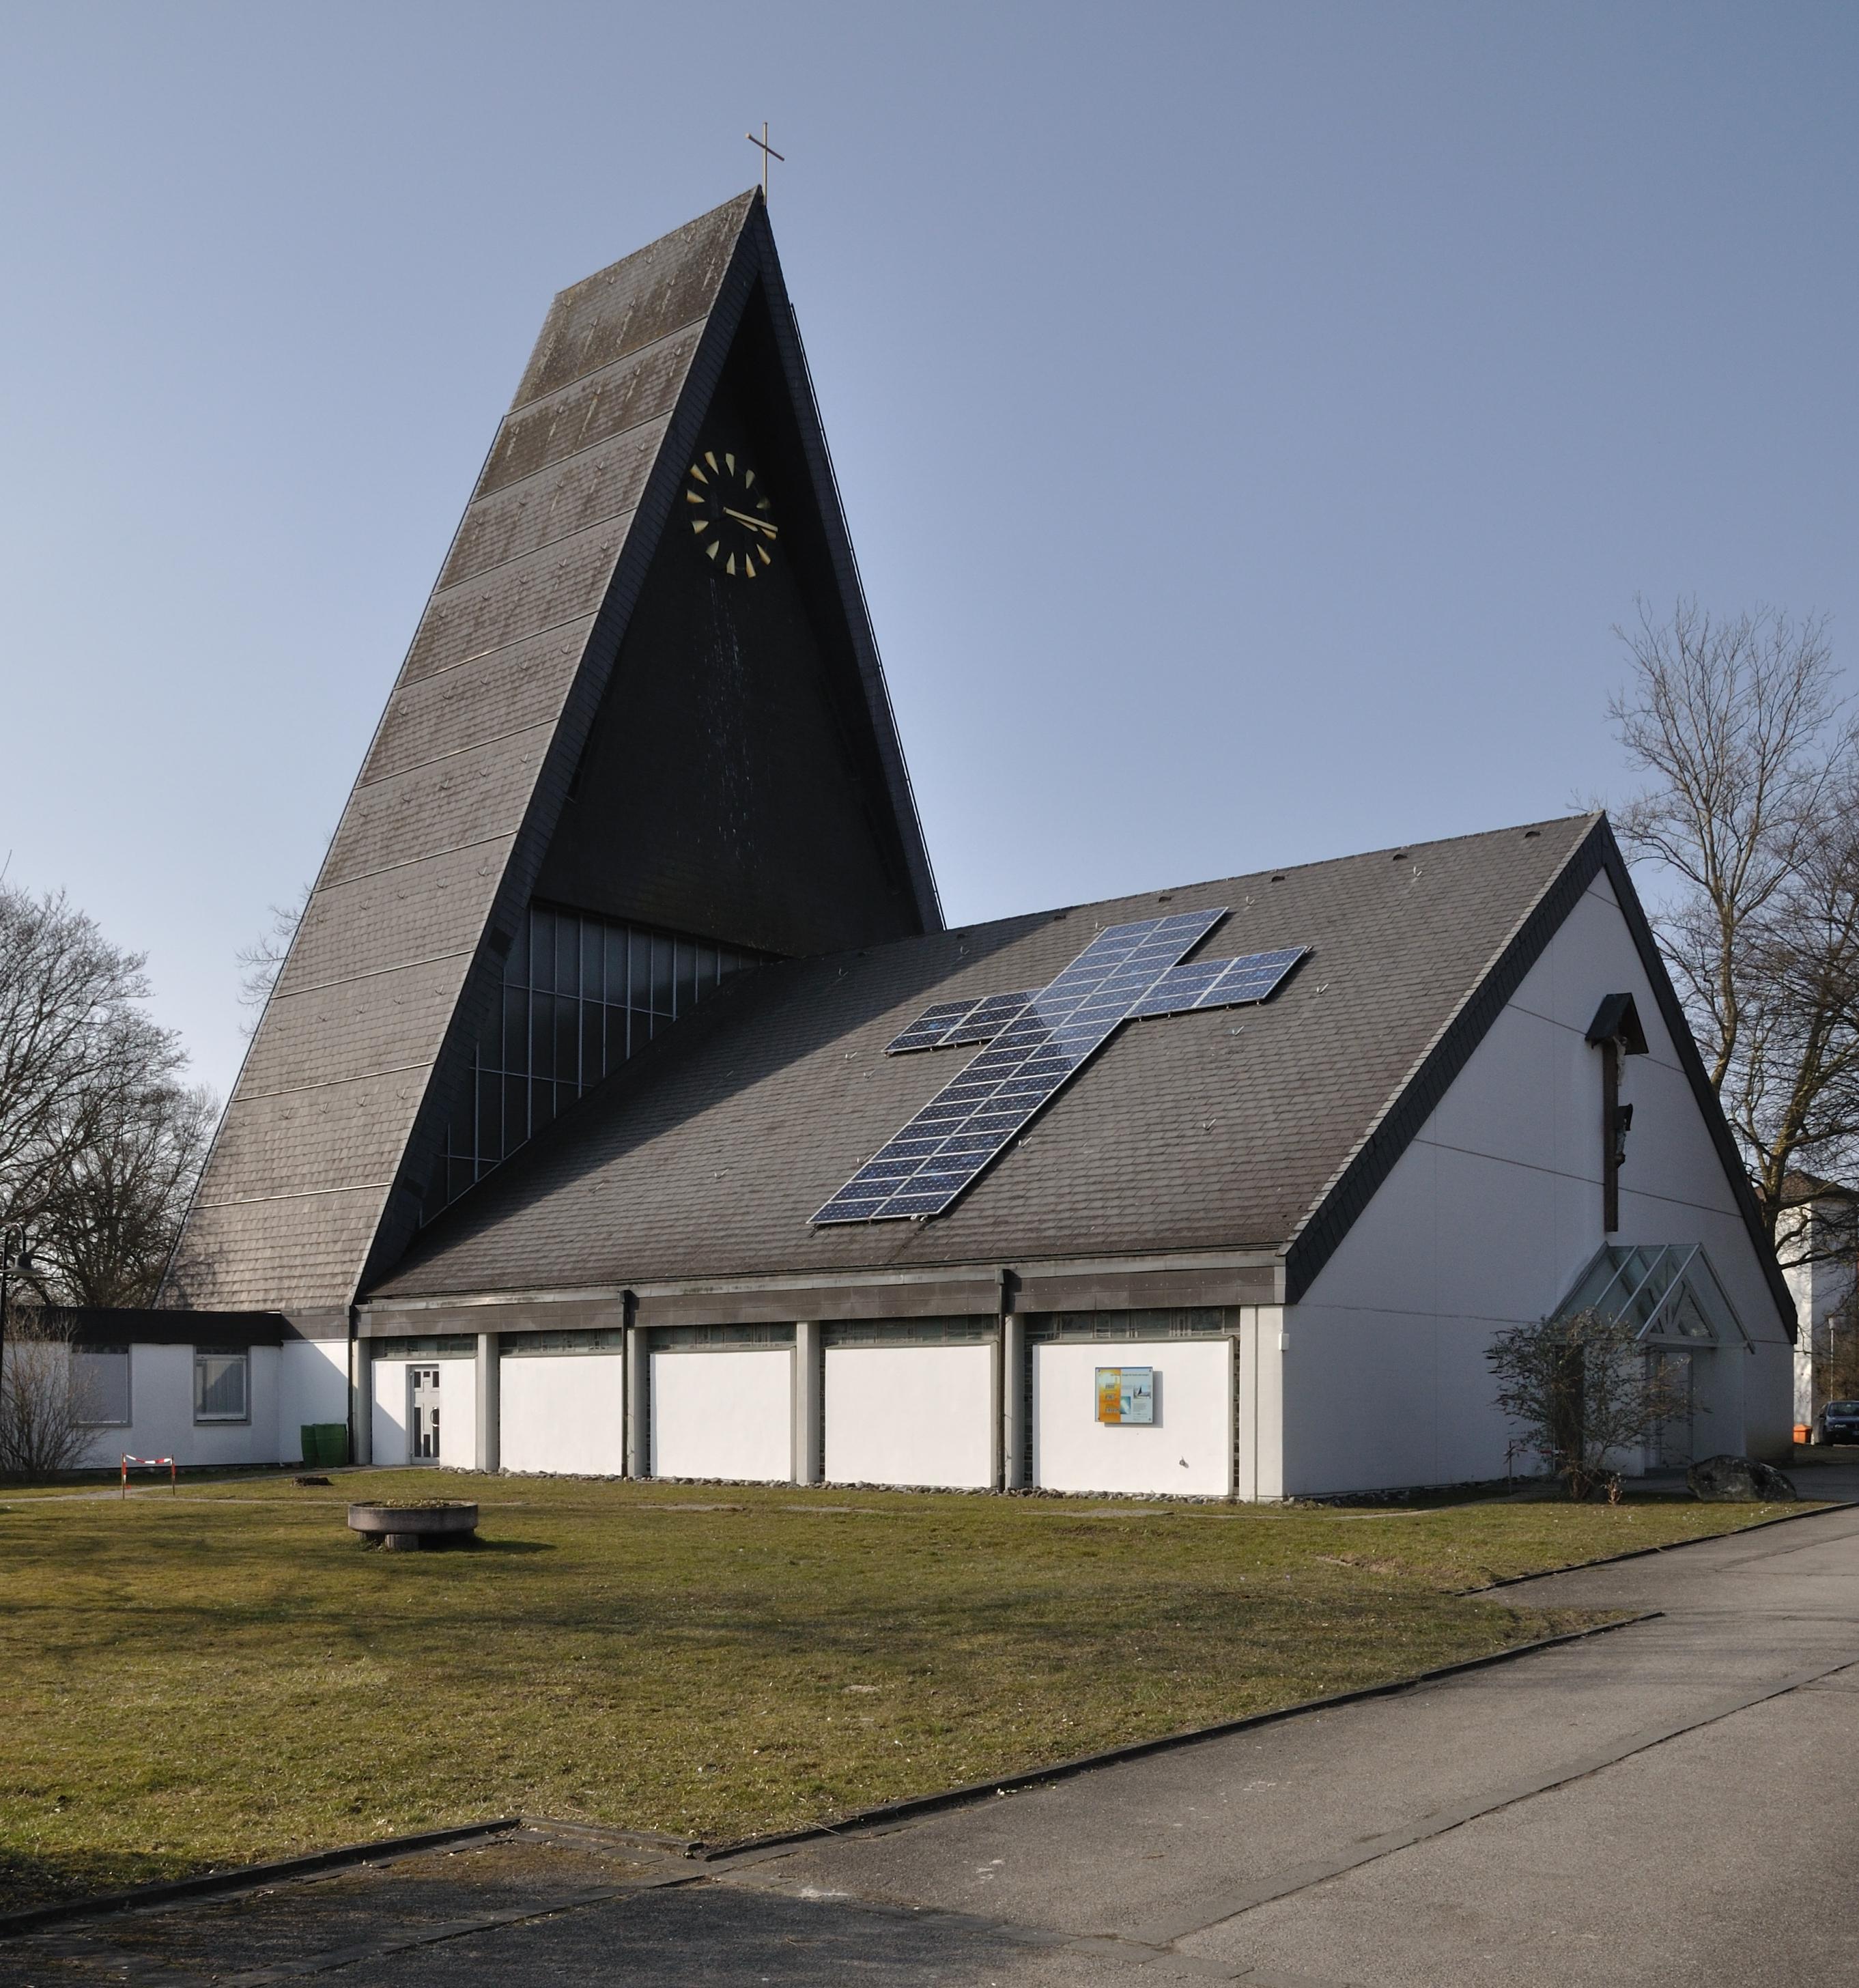 Non Profits Can Go Solar Save Money Under New Virginia